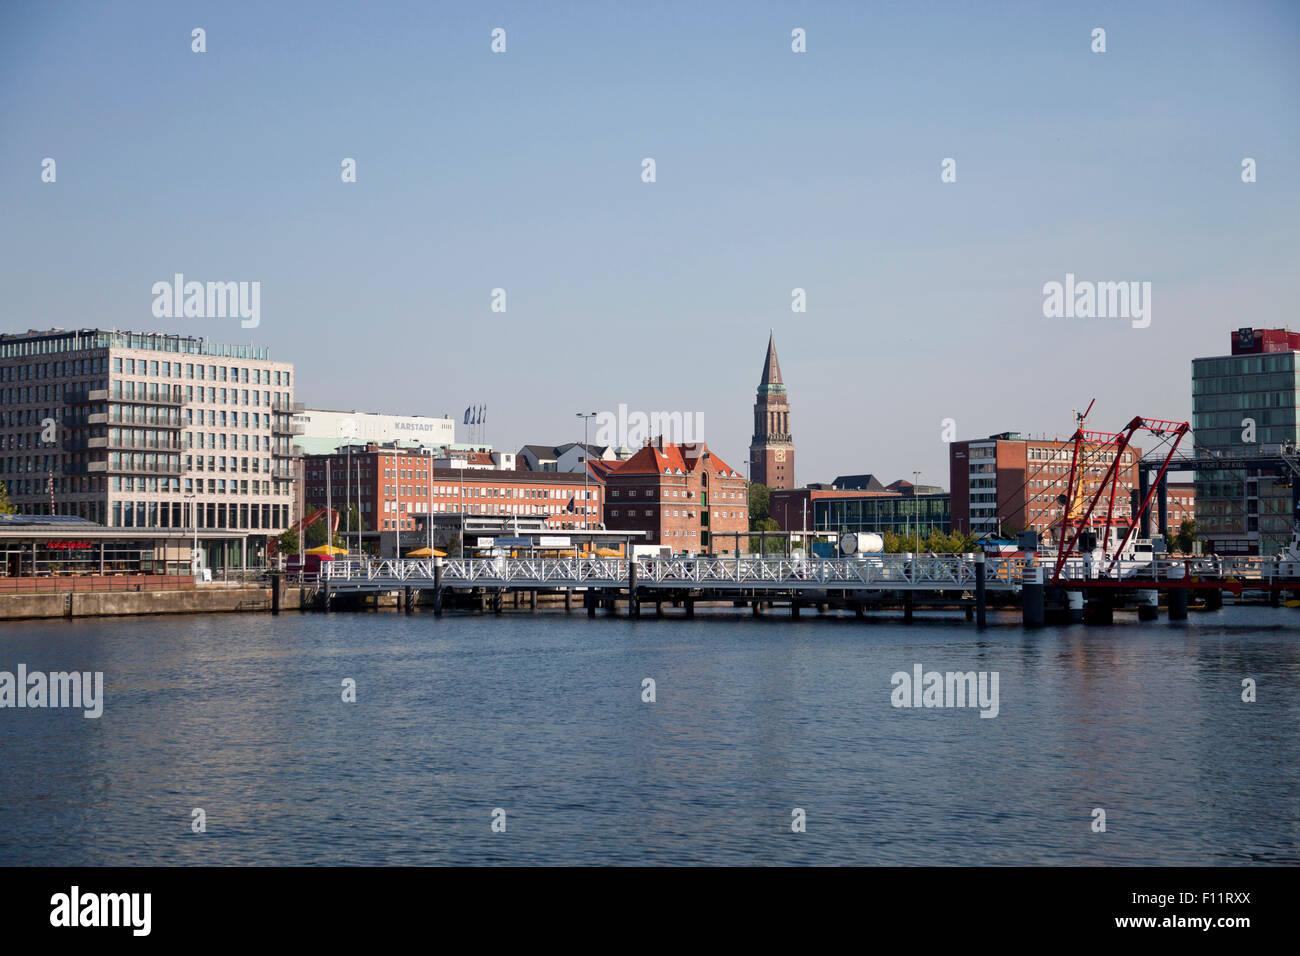 Cityscape with Kiel Fjord, Hörnbrücke and Town Hall Tower, Kiel, Schleswig-Holstein, Germany, Europe - Stock Image